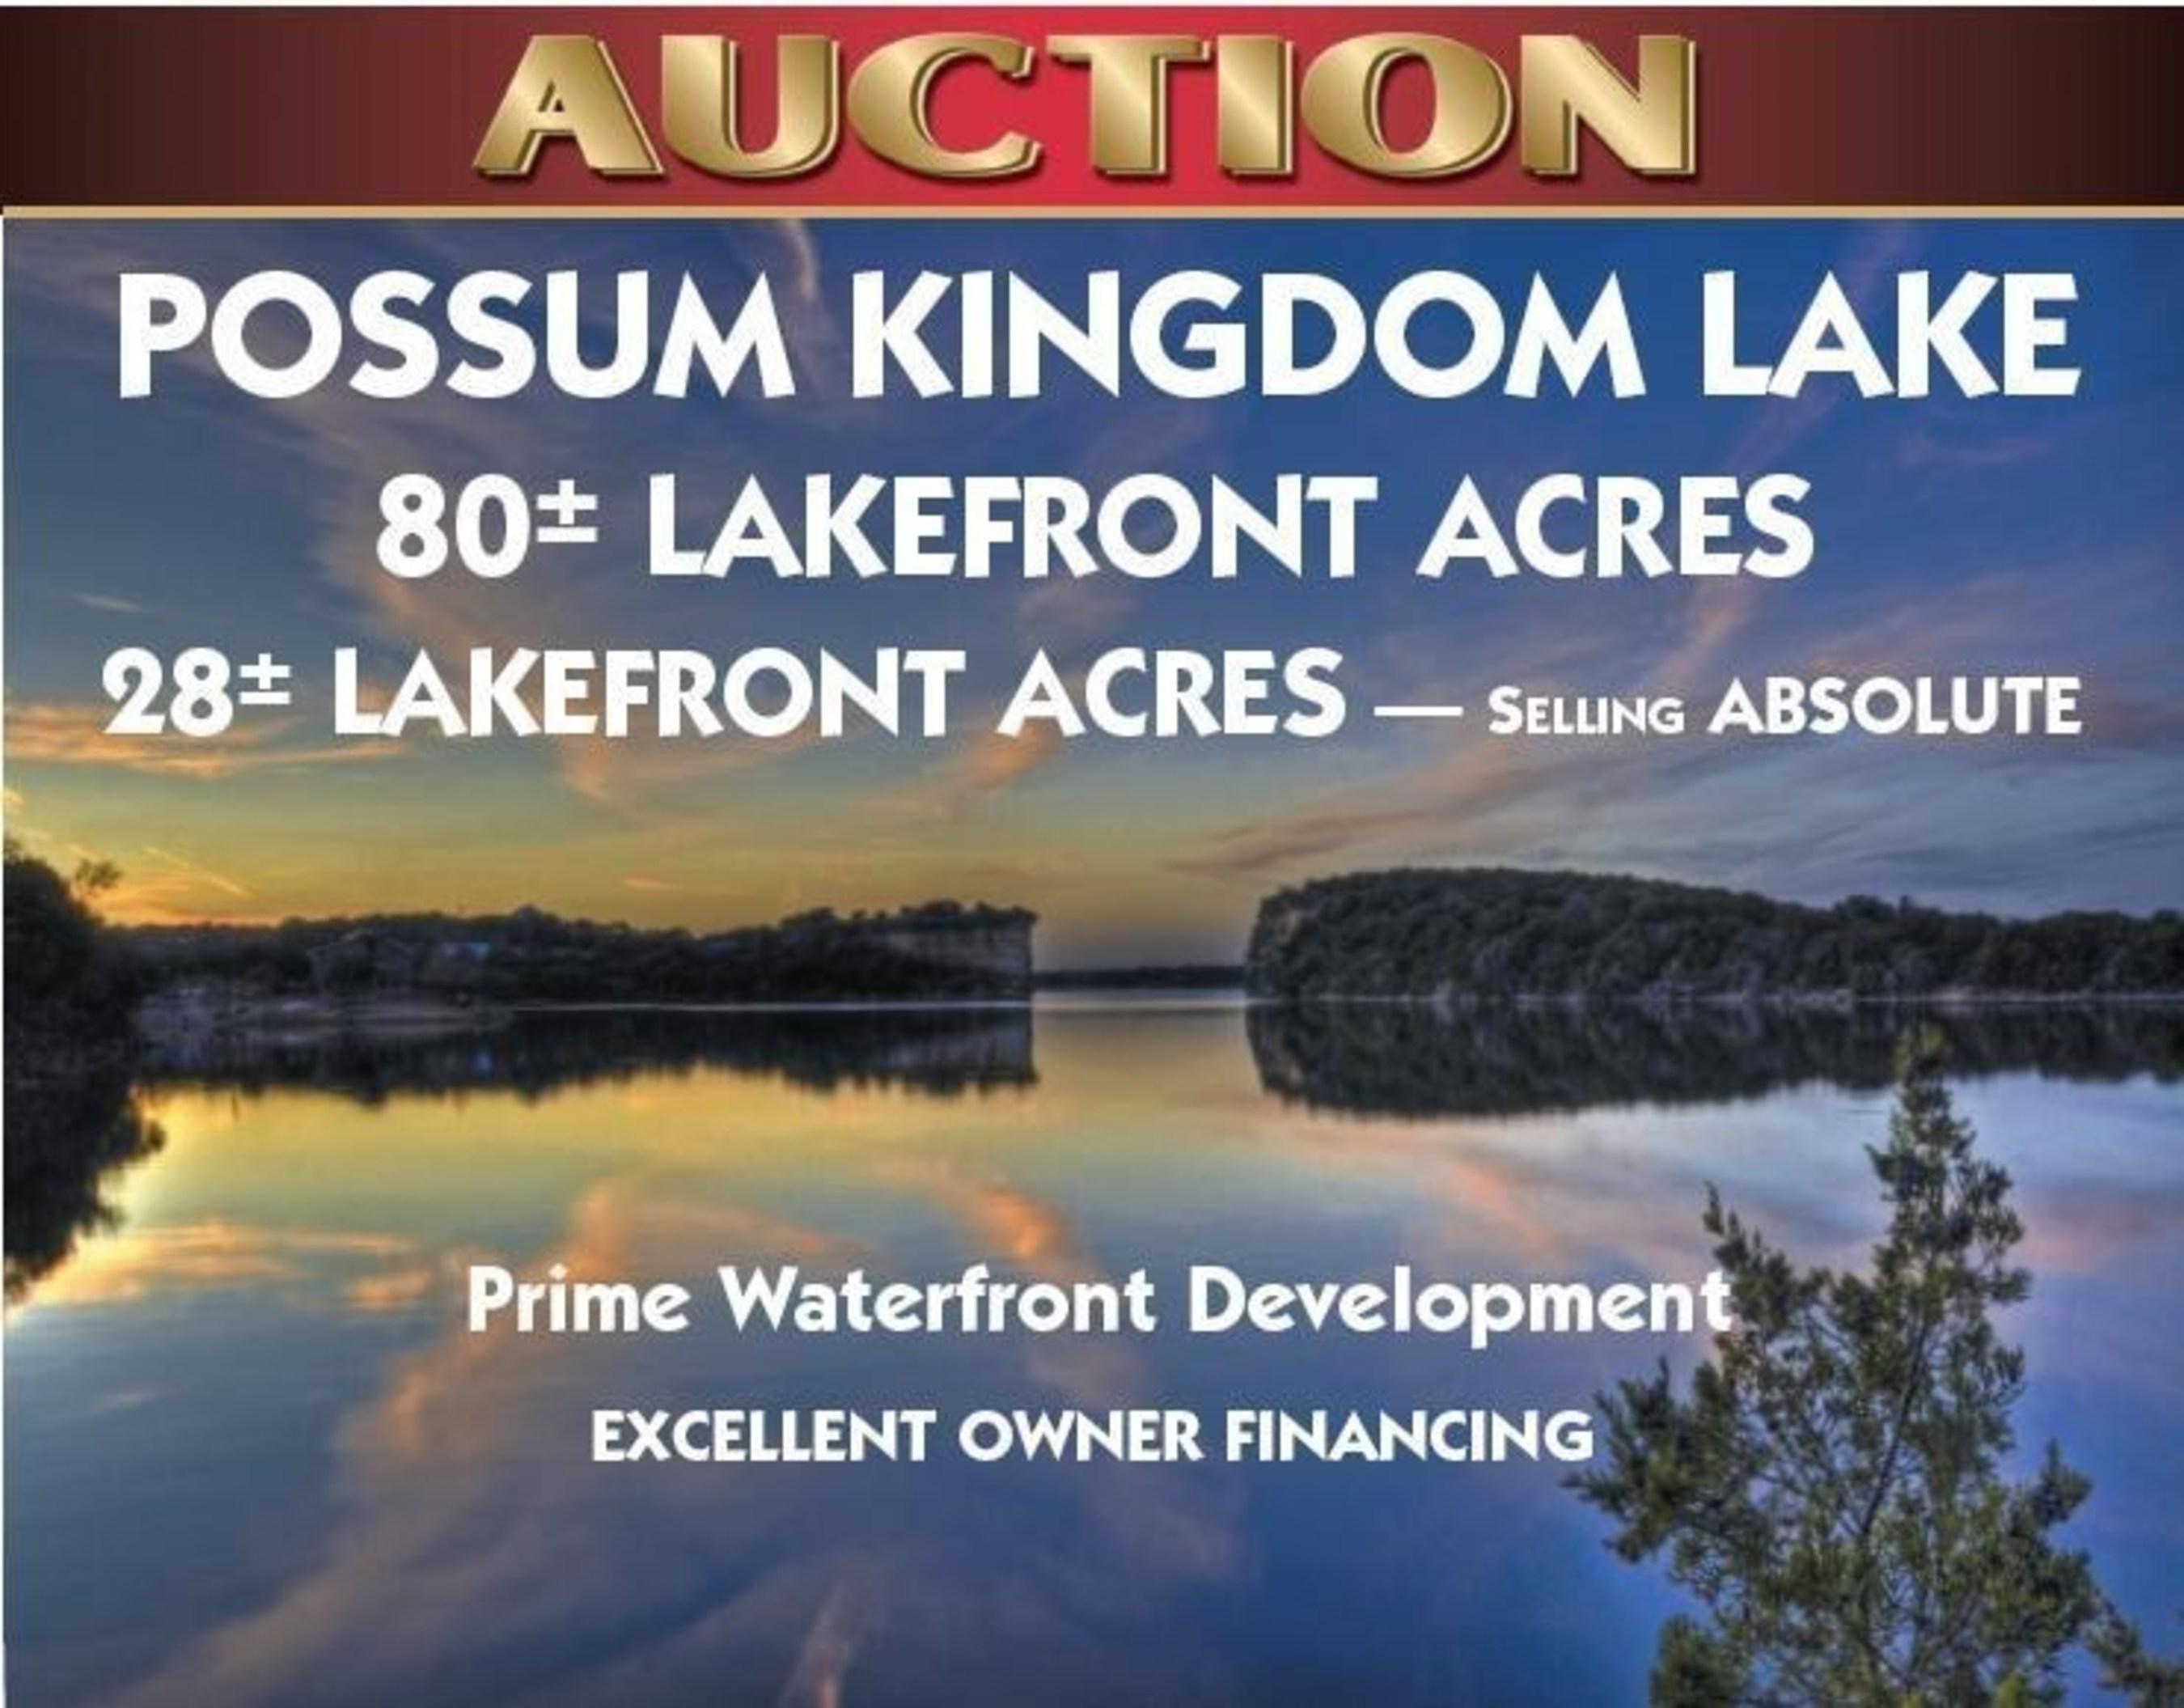 Waterfront Development Auction - Possum Kingdom Lake